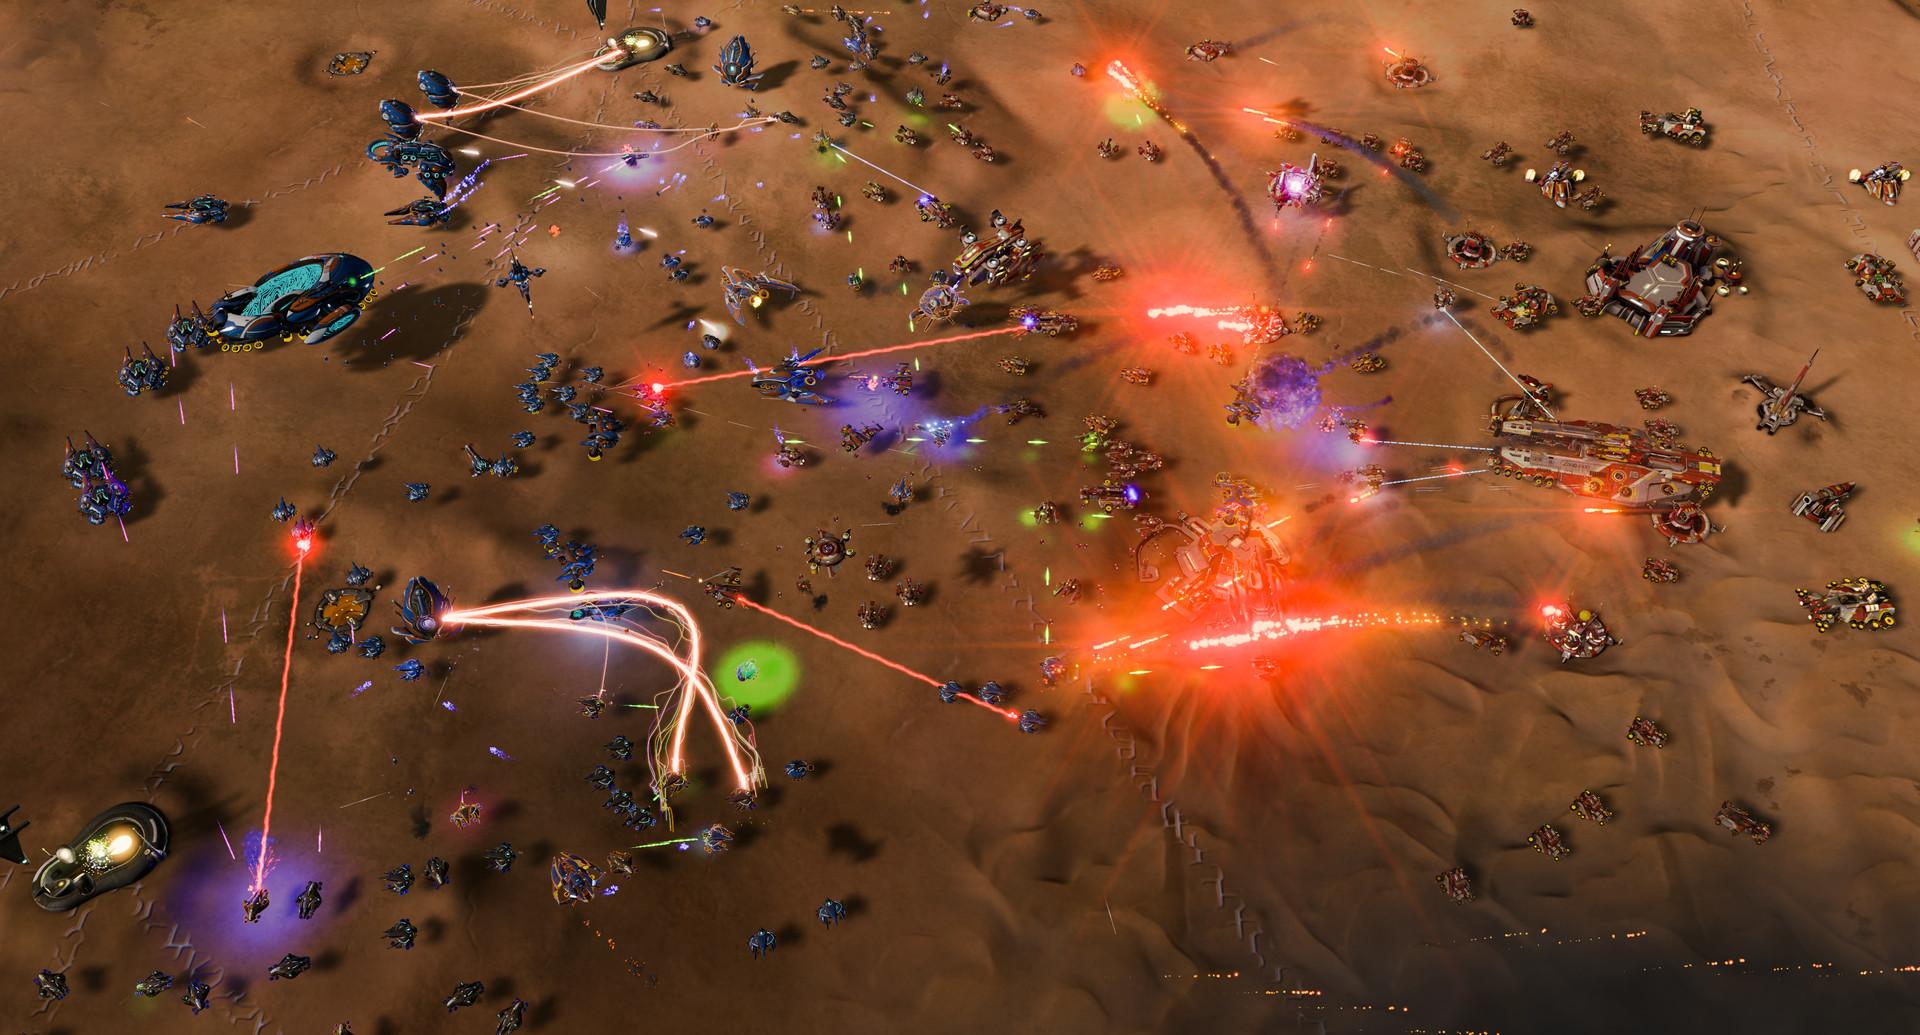 Ashes of the Singularity: Escalation Screenshot 1